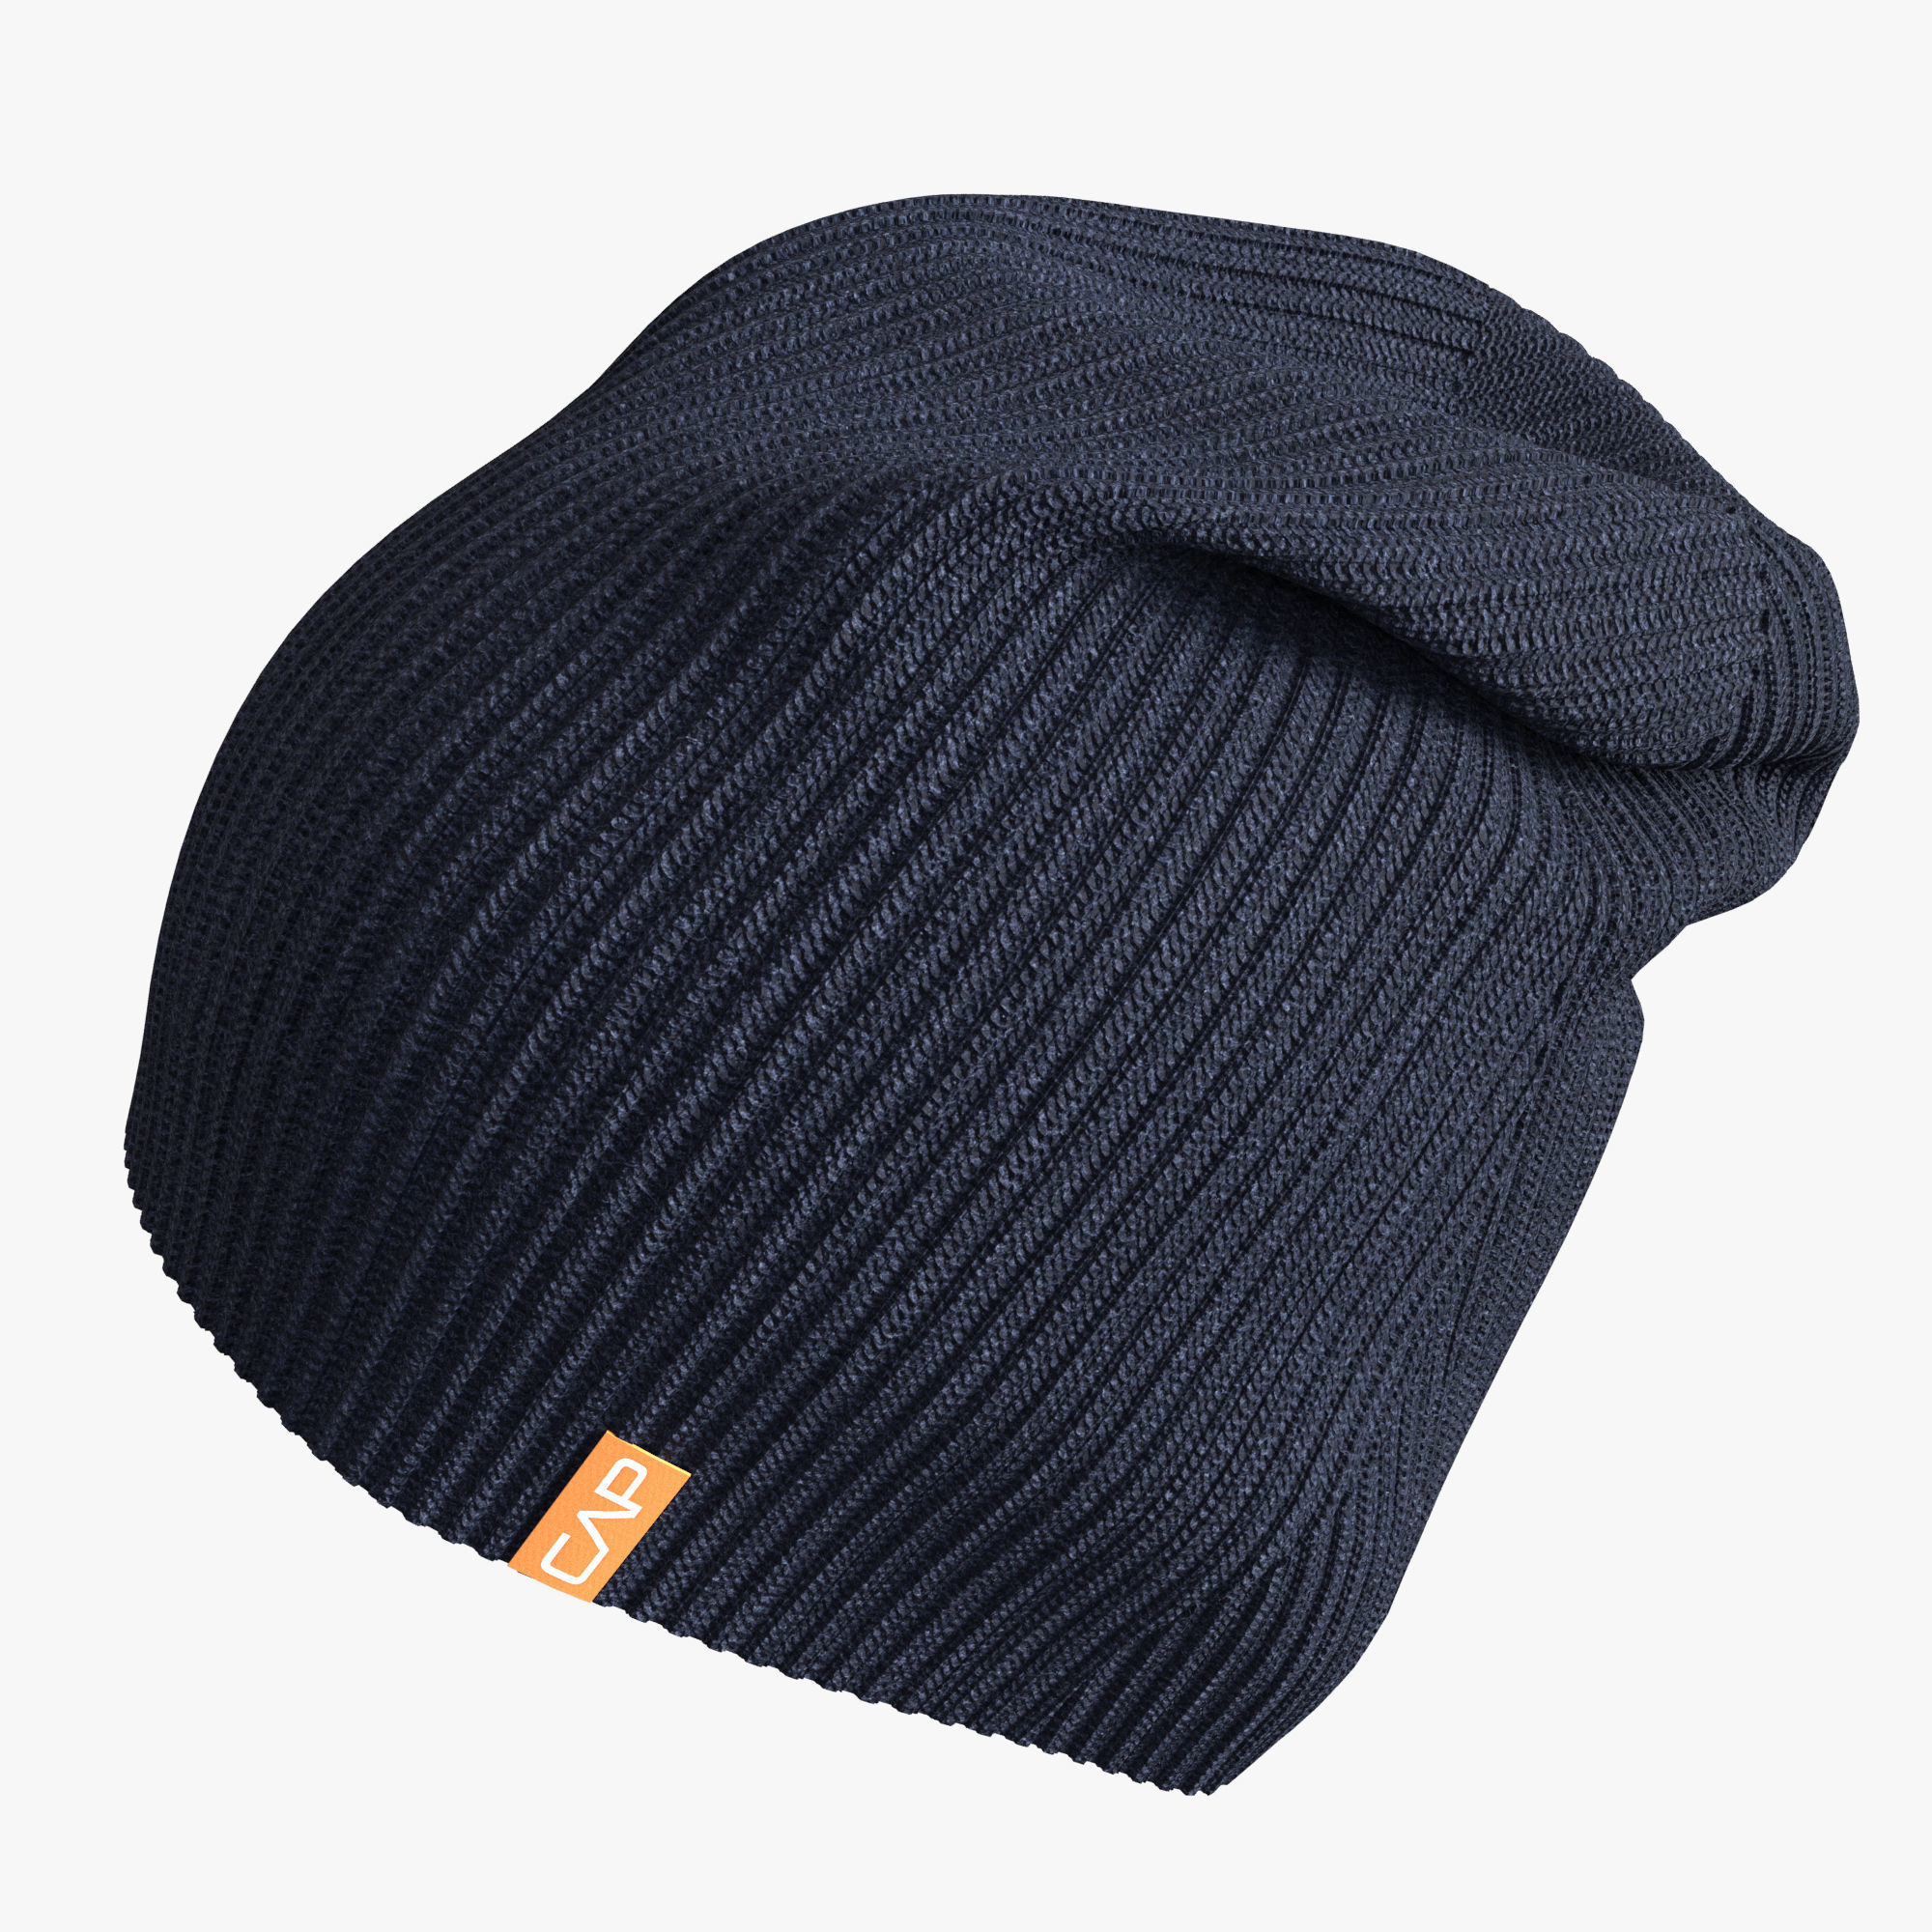 Low poly cap